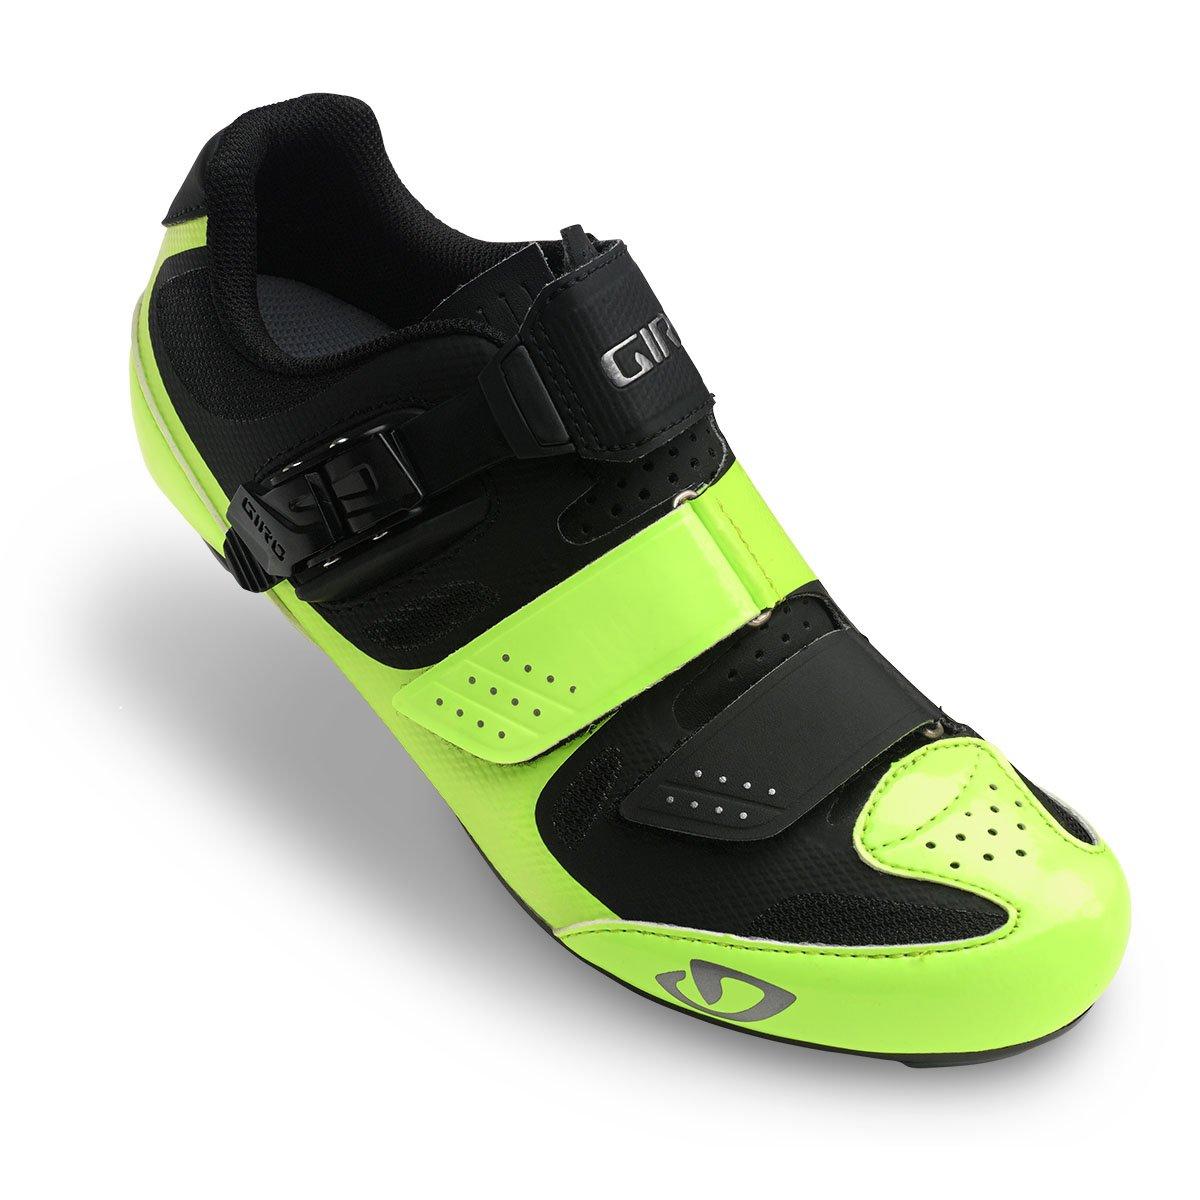 Giro Solara II Womens Road Cycling Shoes B01M0QQAUC 37|Highlight Yellow/Black